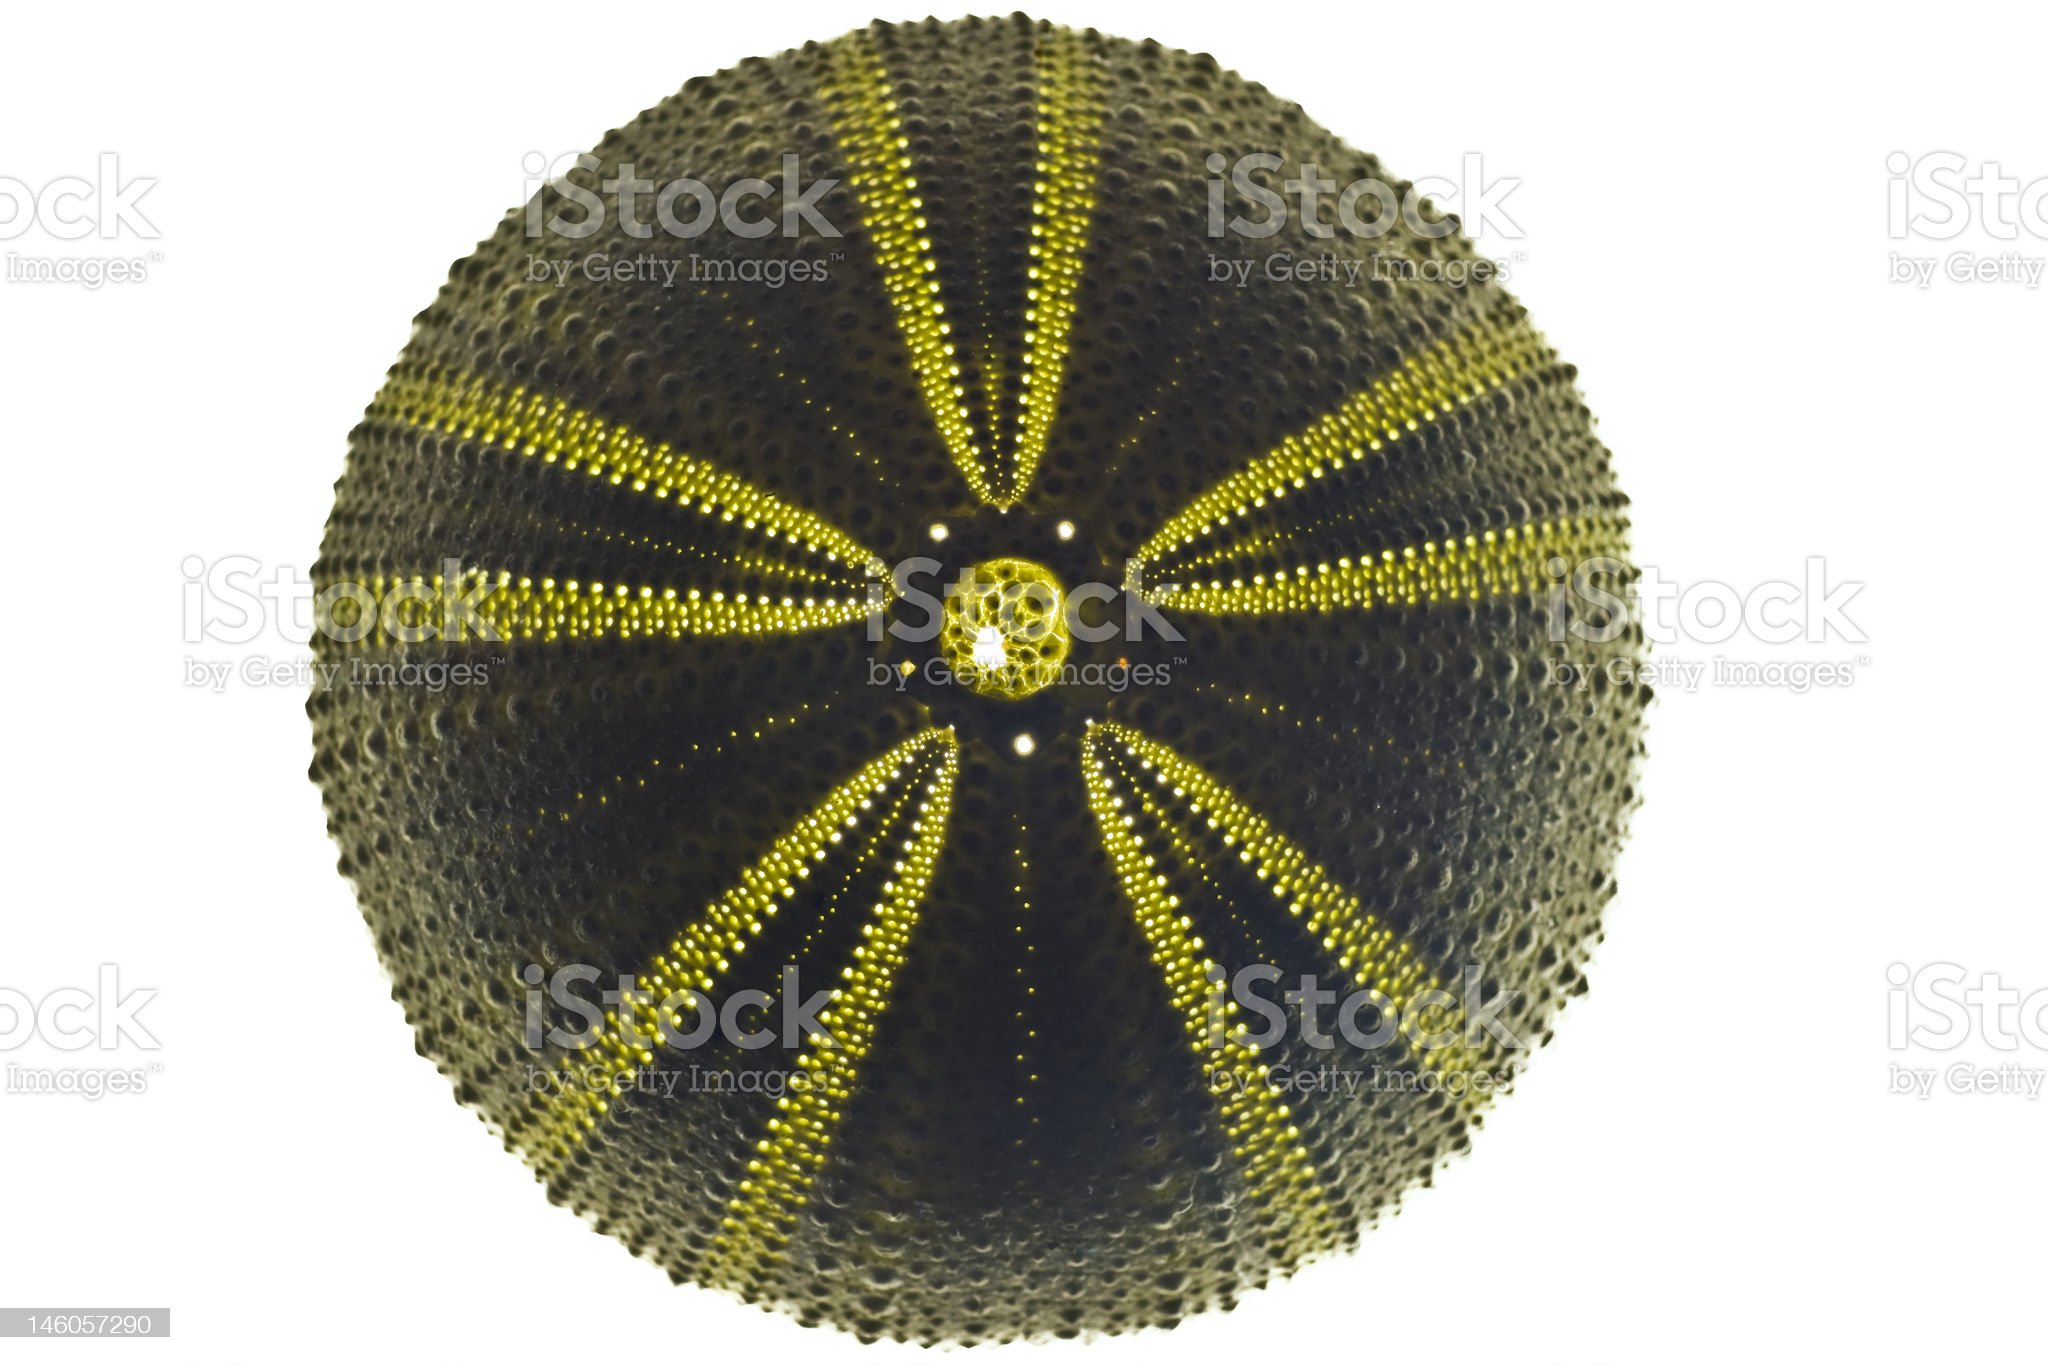 backlit green sea urchin royalty-free stock photo